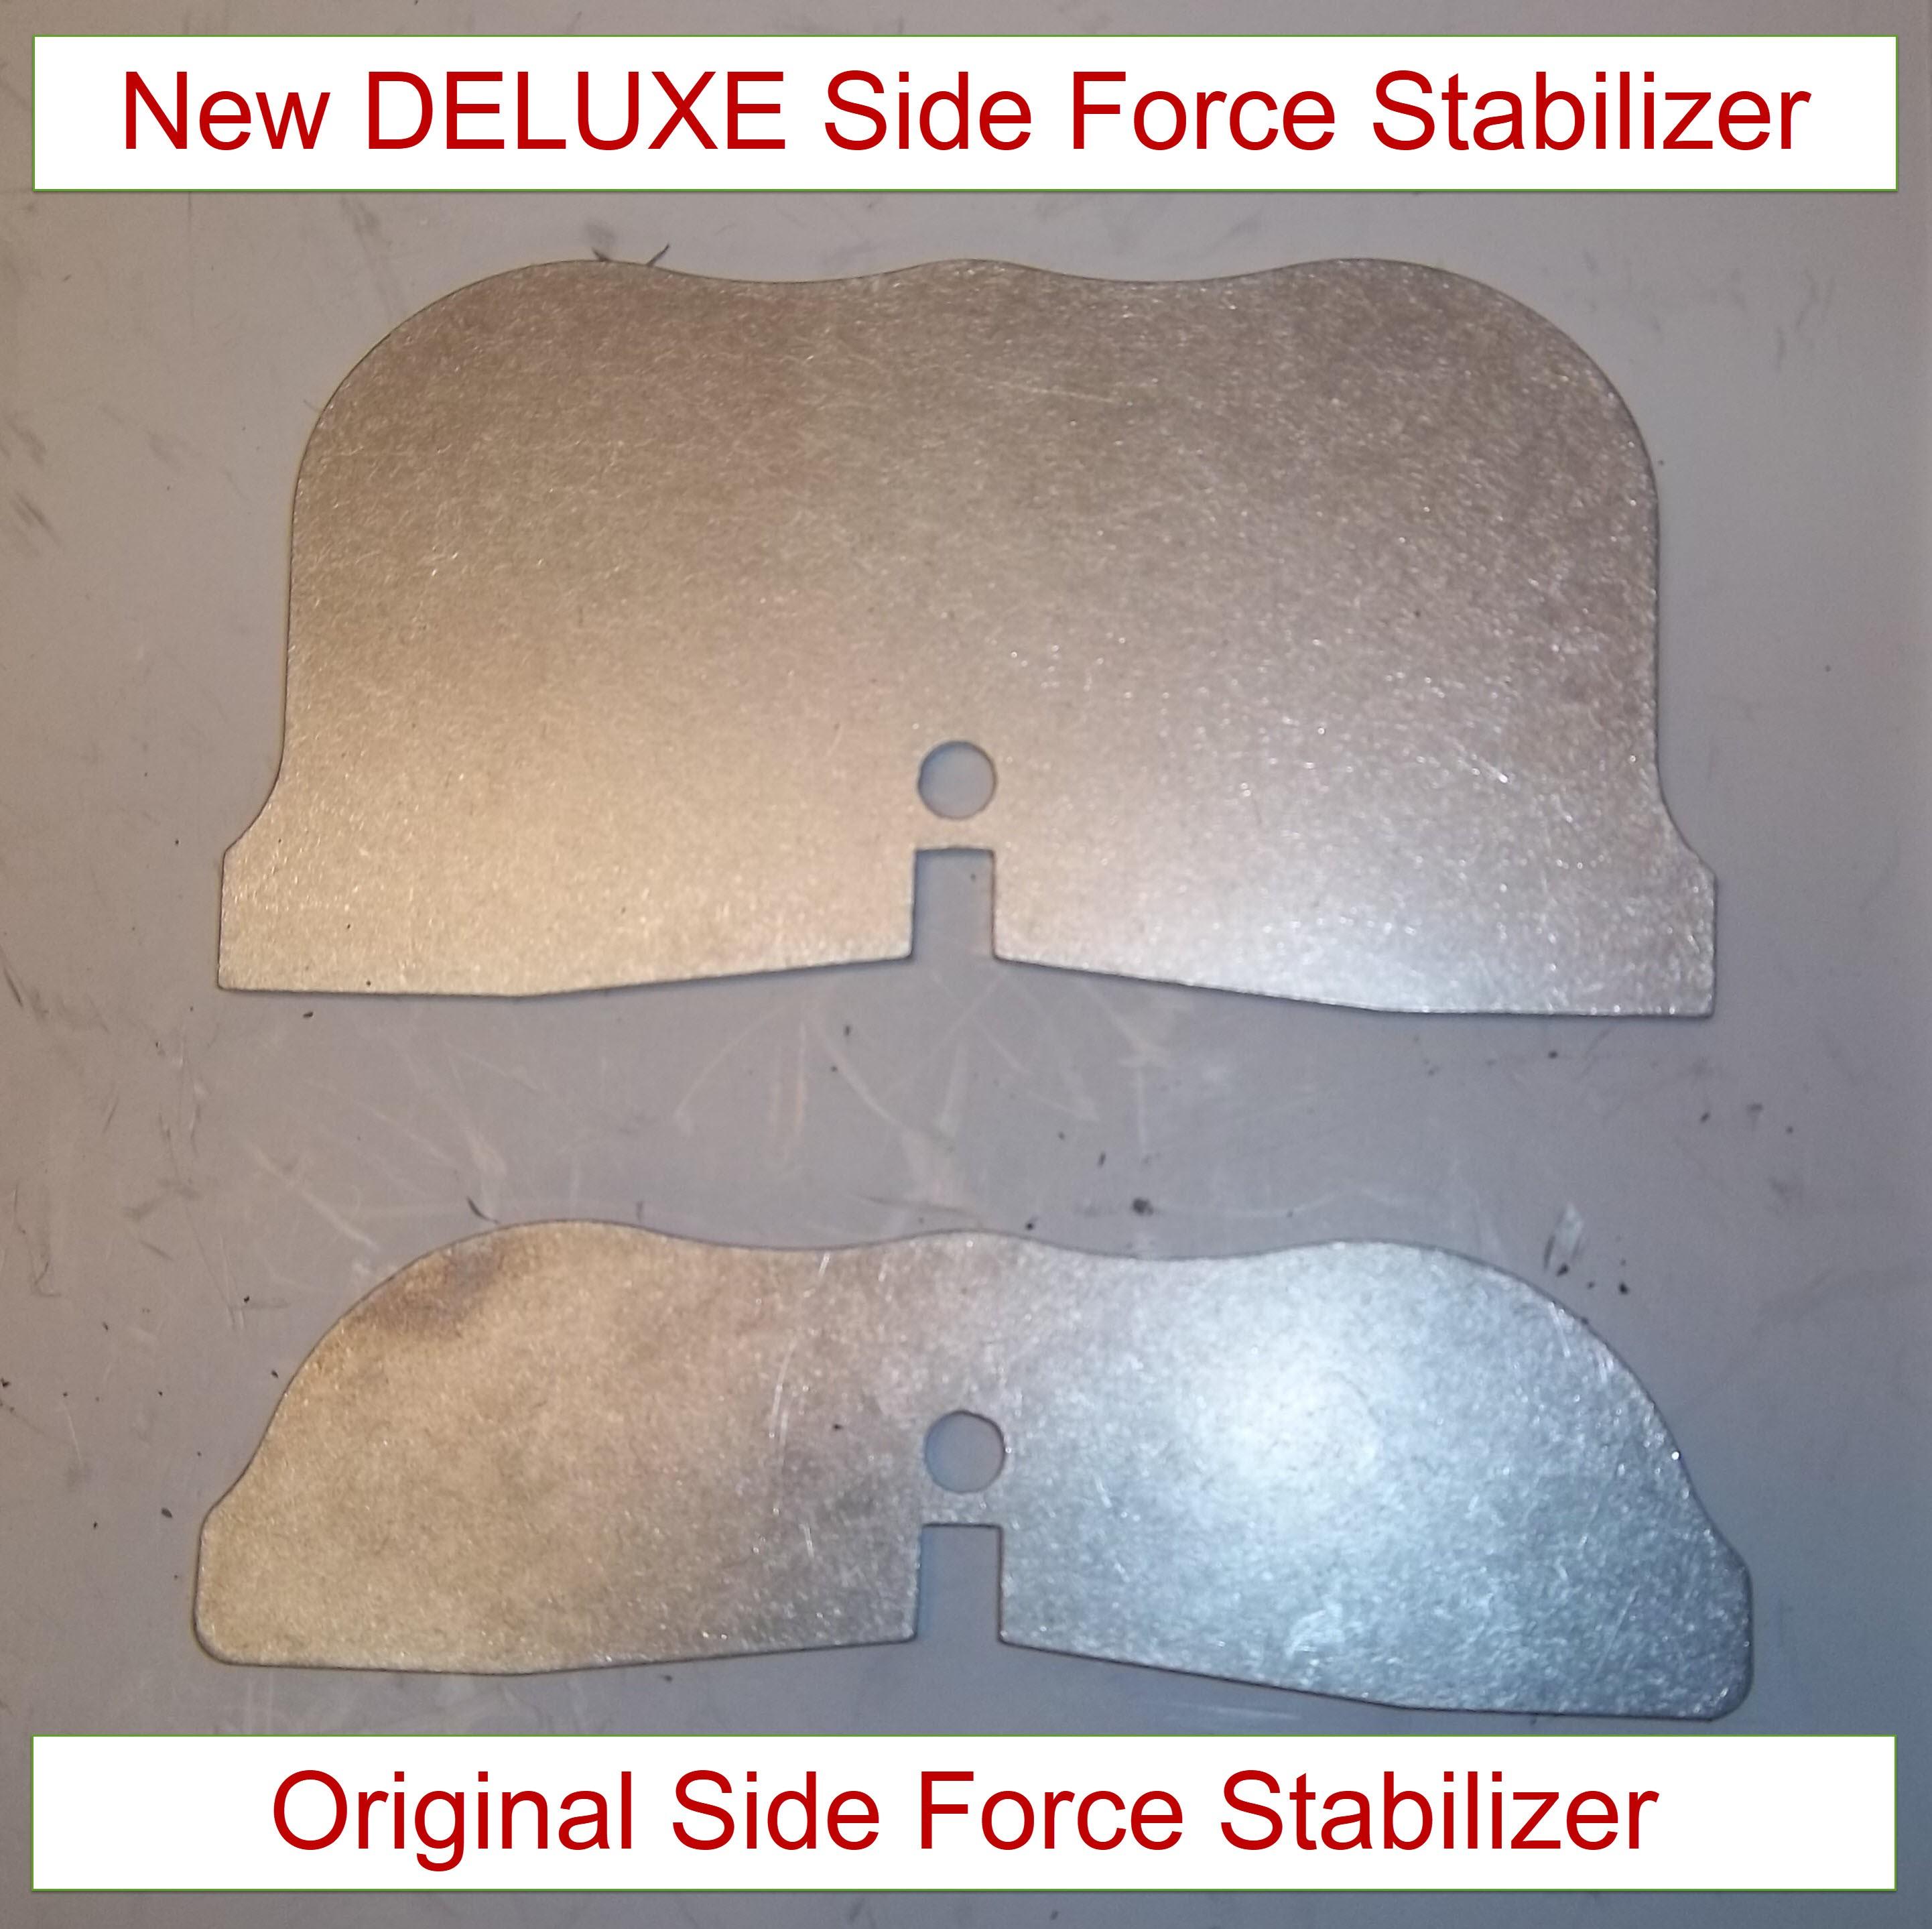 Ultimate AK-19 Side Force Stabilizer - Deluxe vs Original